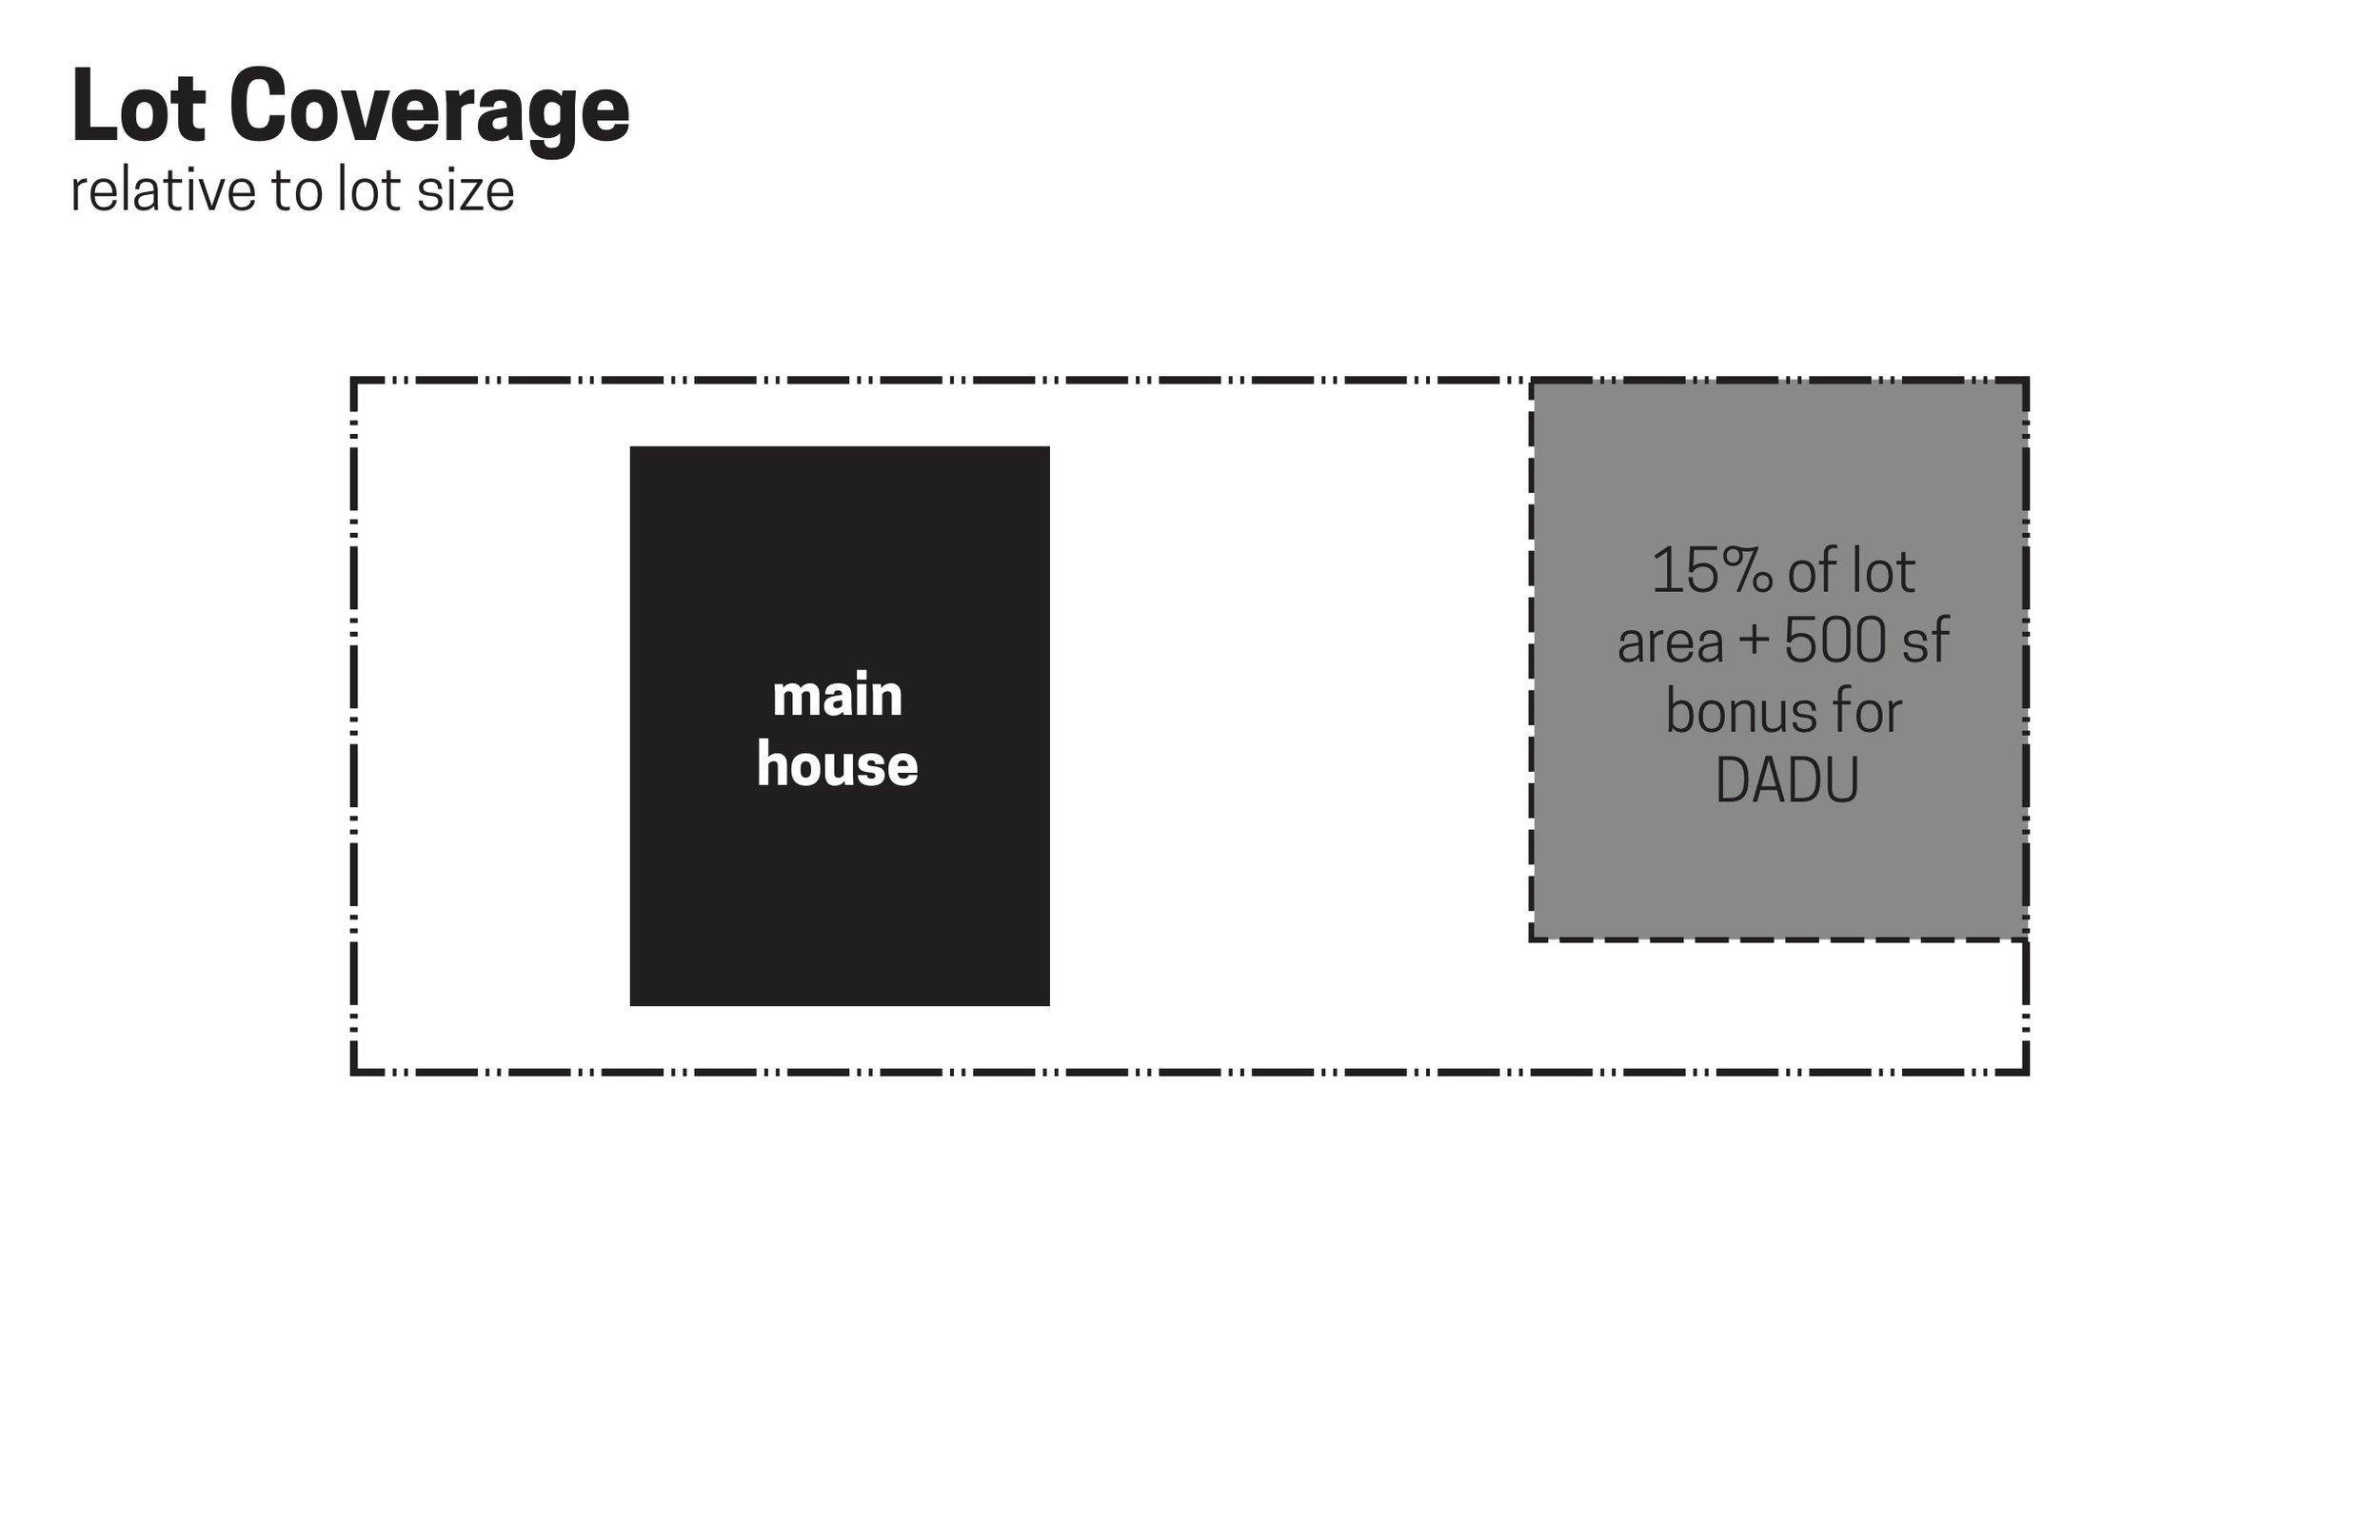 wc-studio-DADU-lot-coverage-relative-to-lot-size.jpg